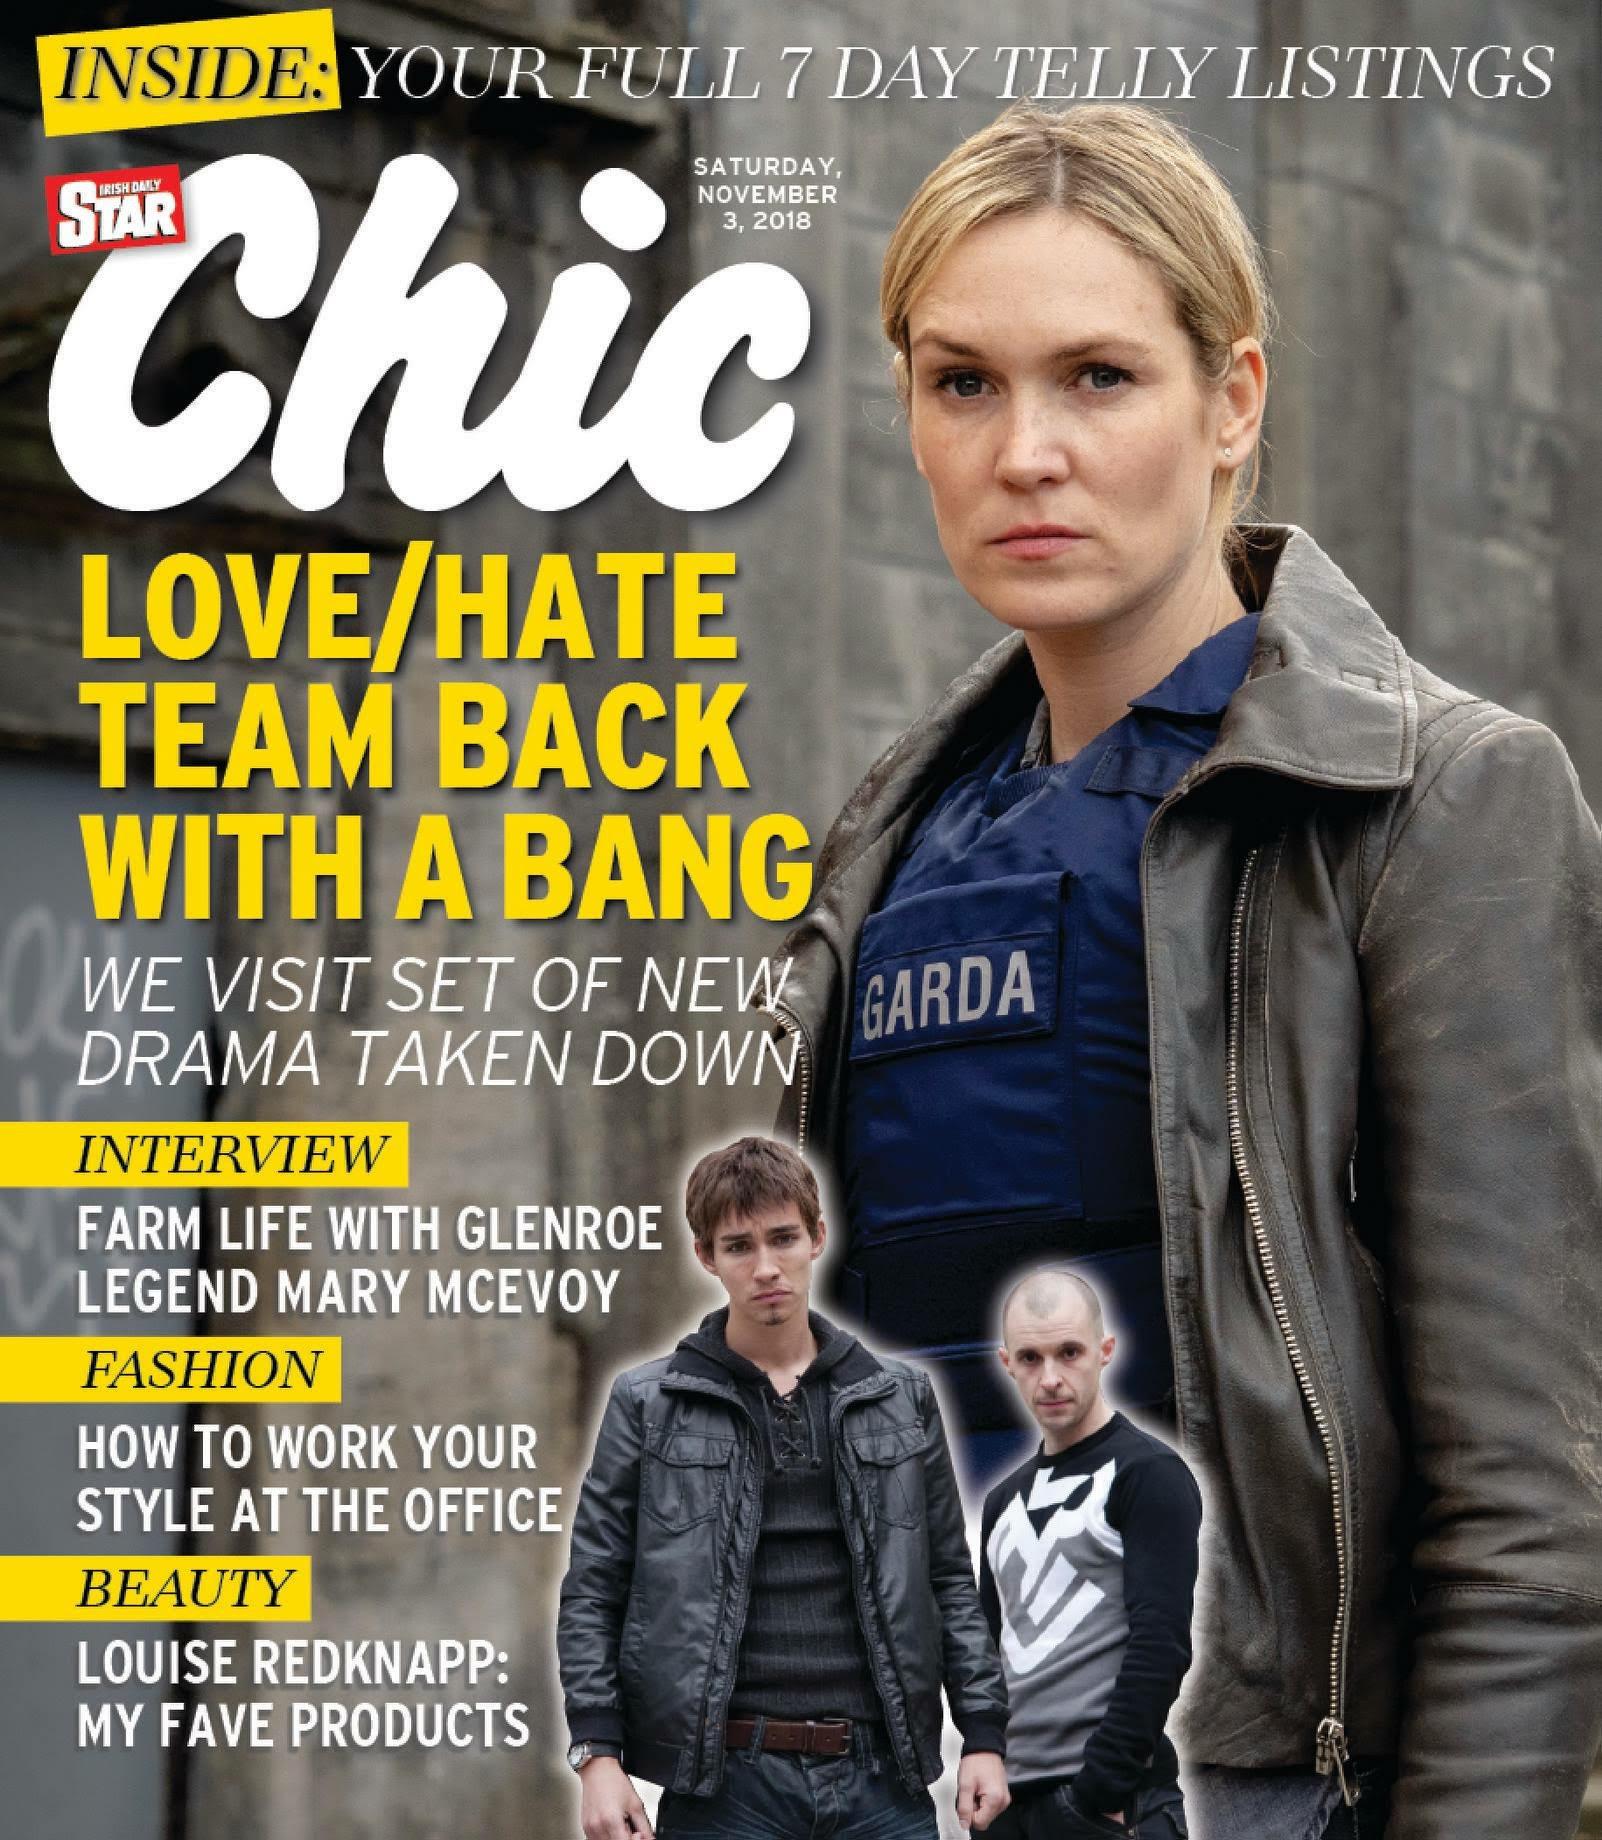 star chic cover.jpg